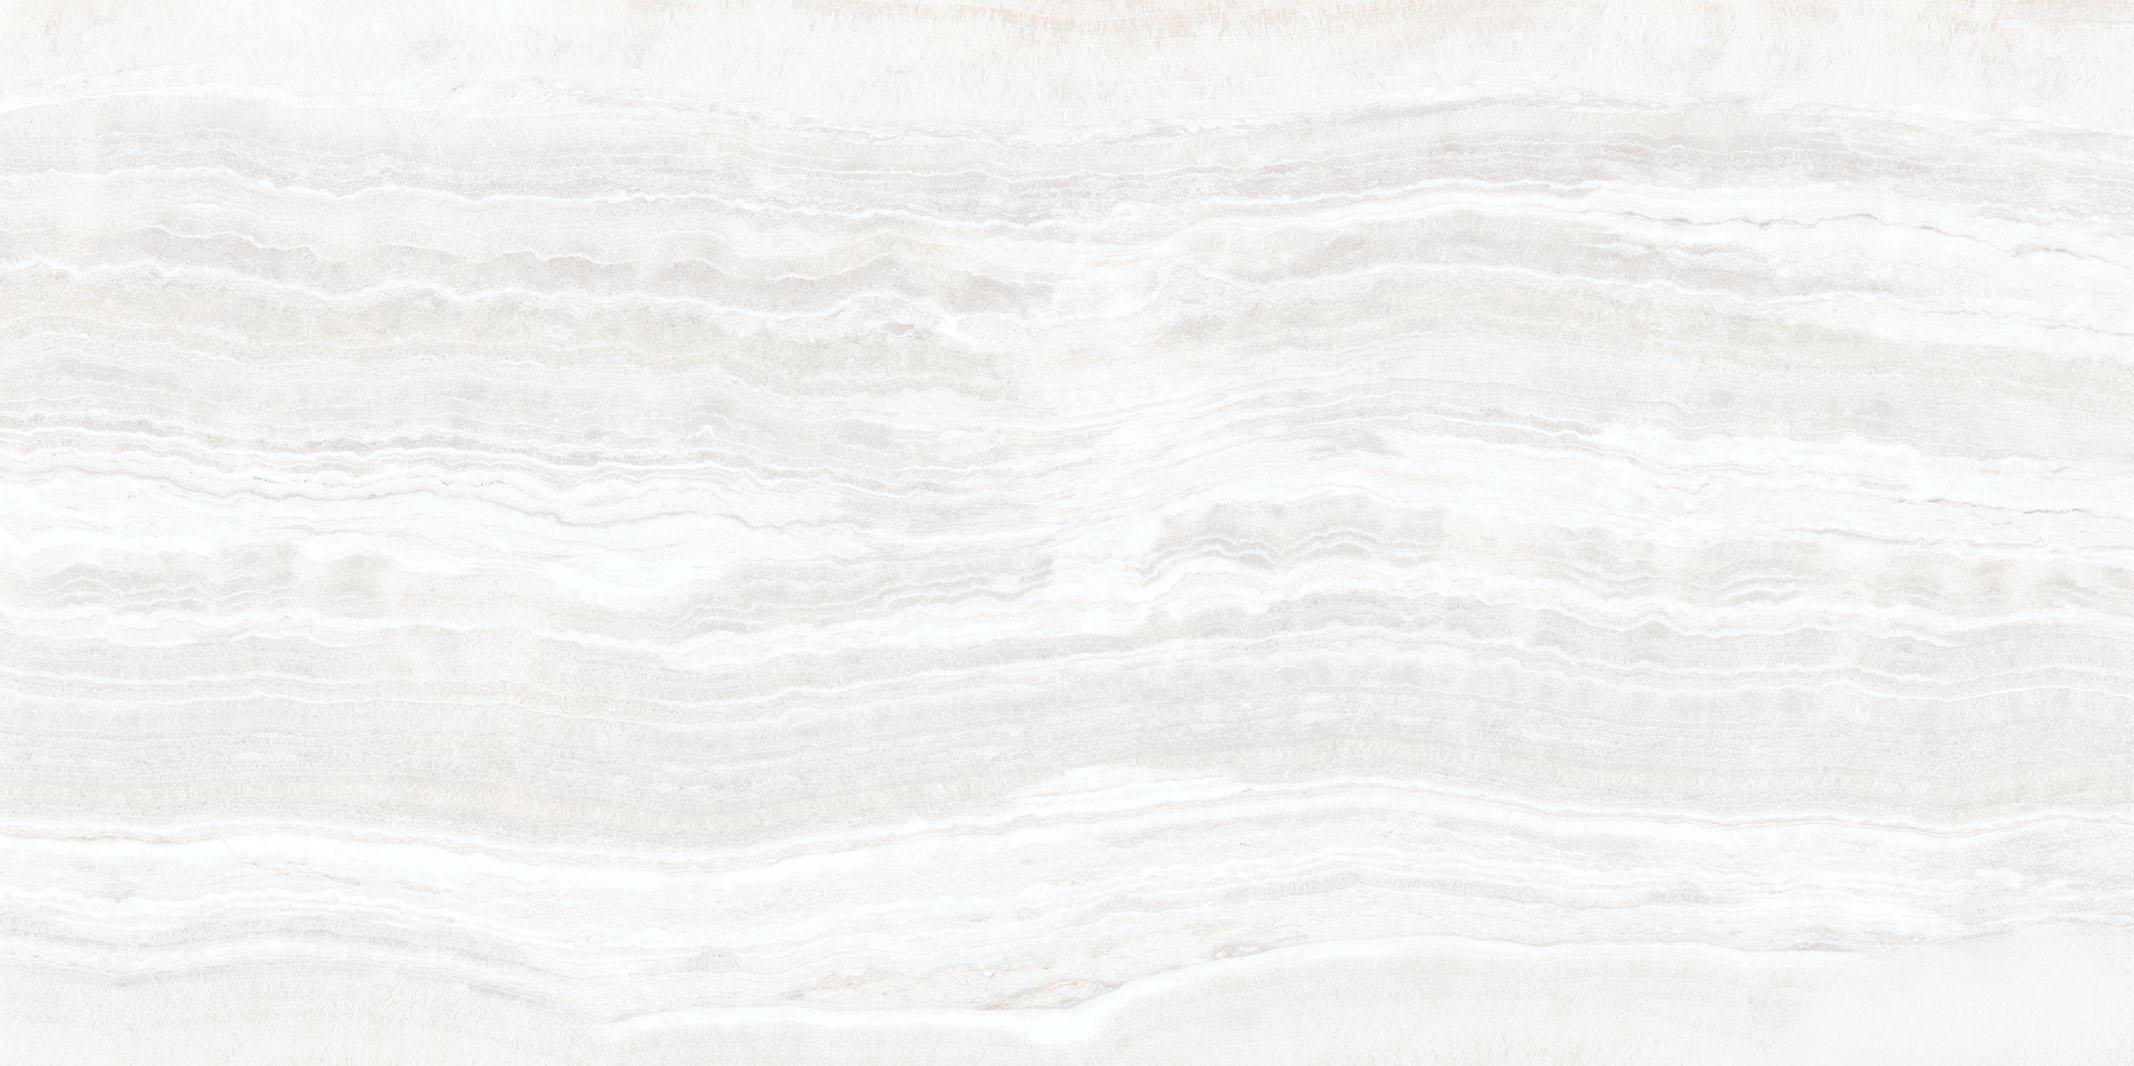 Onyx of Cerim White Matte 10mm 30 x 60